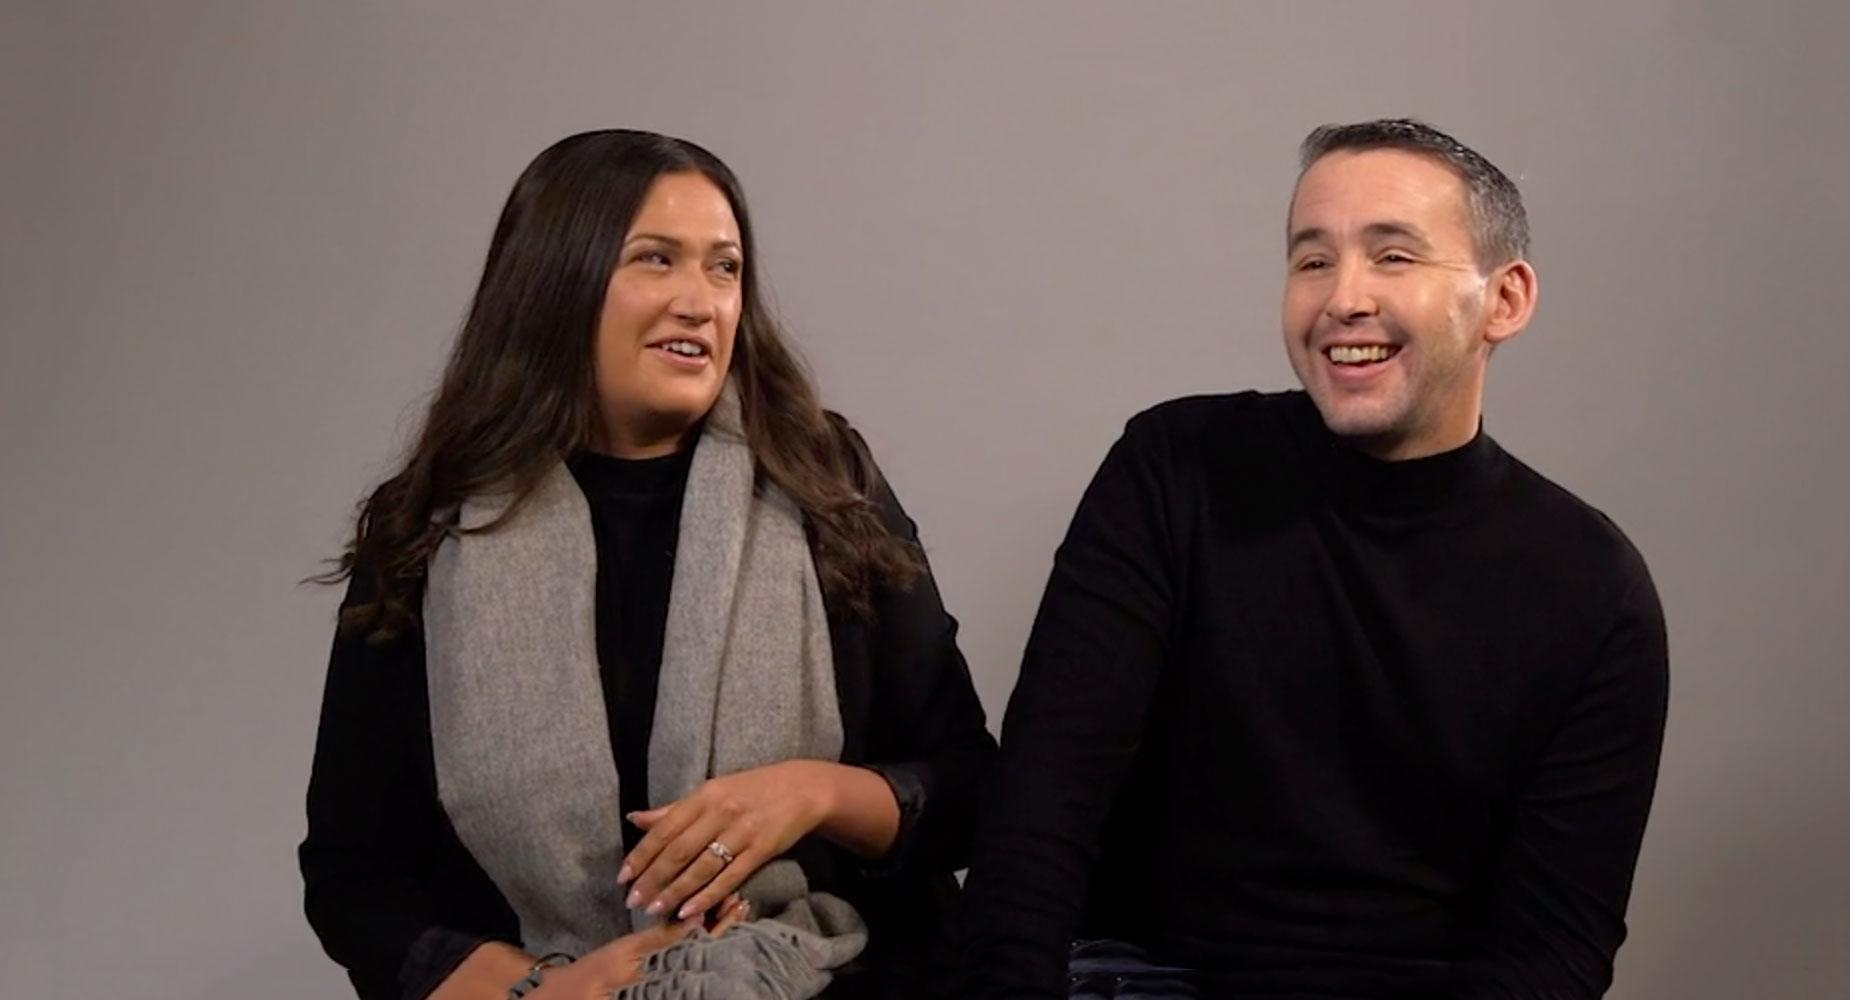 Matt & Michaela's Story